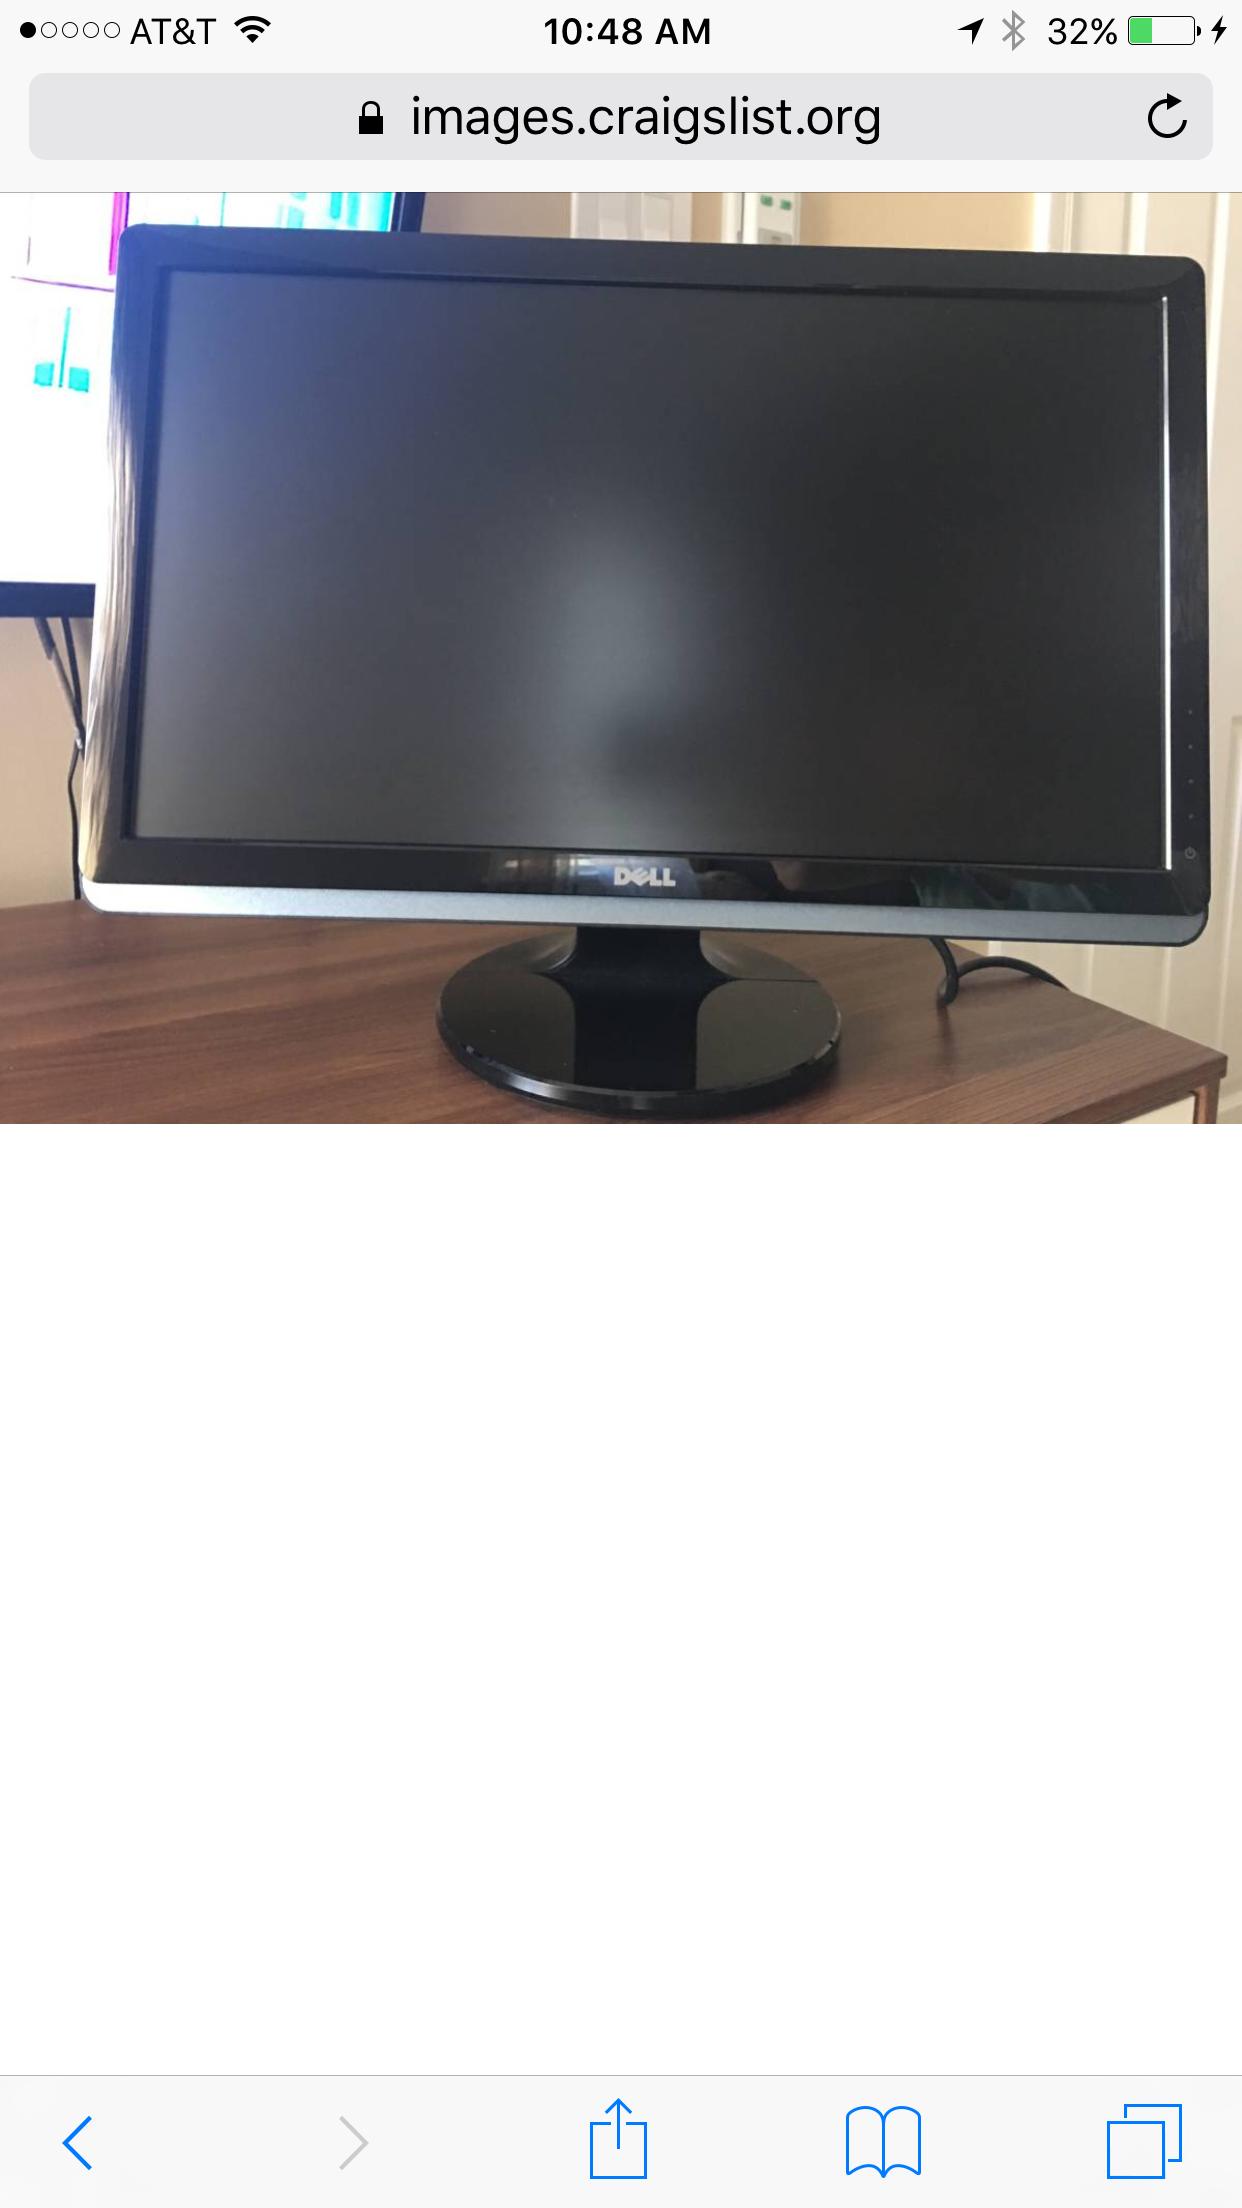 Ogłoszenie darmowe. Lokalizacja:  Trenton, Philadelphia. COMPRA Y VENTAS - Electrónica. Se vende monitor Dell ST2220L.